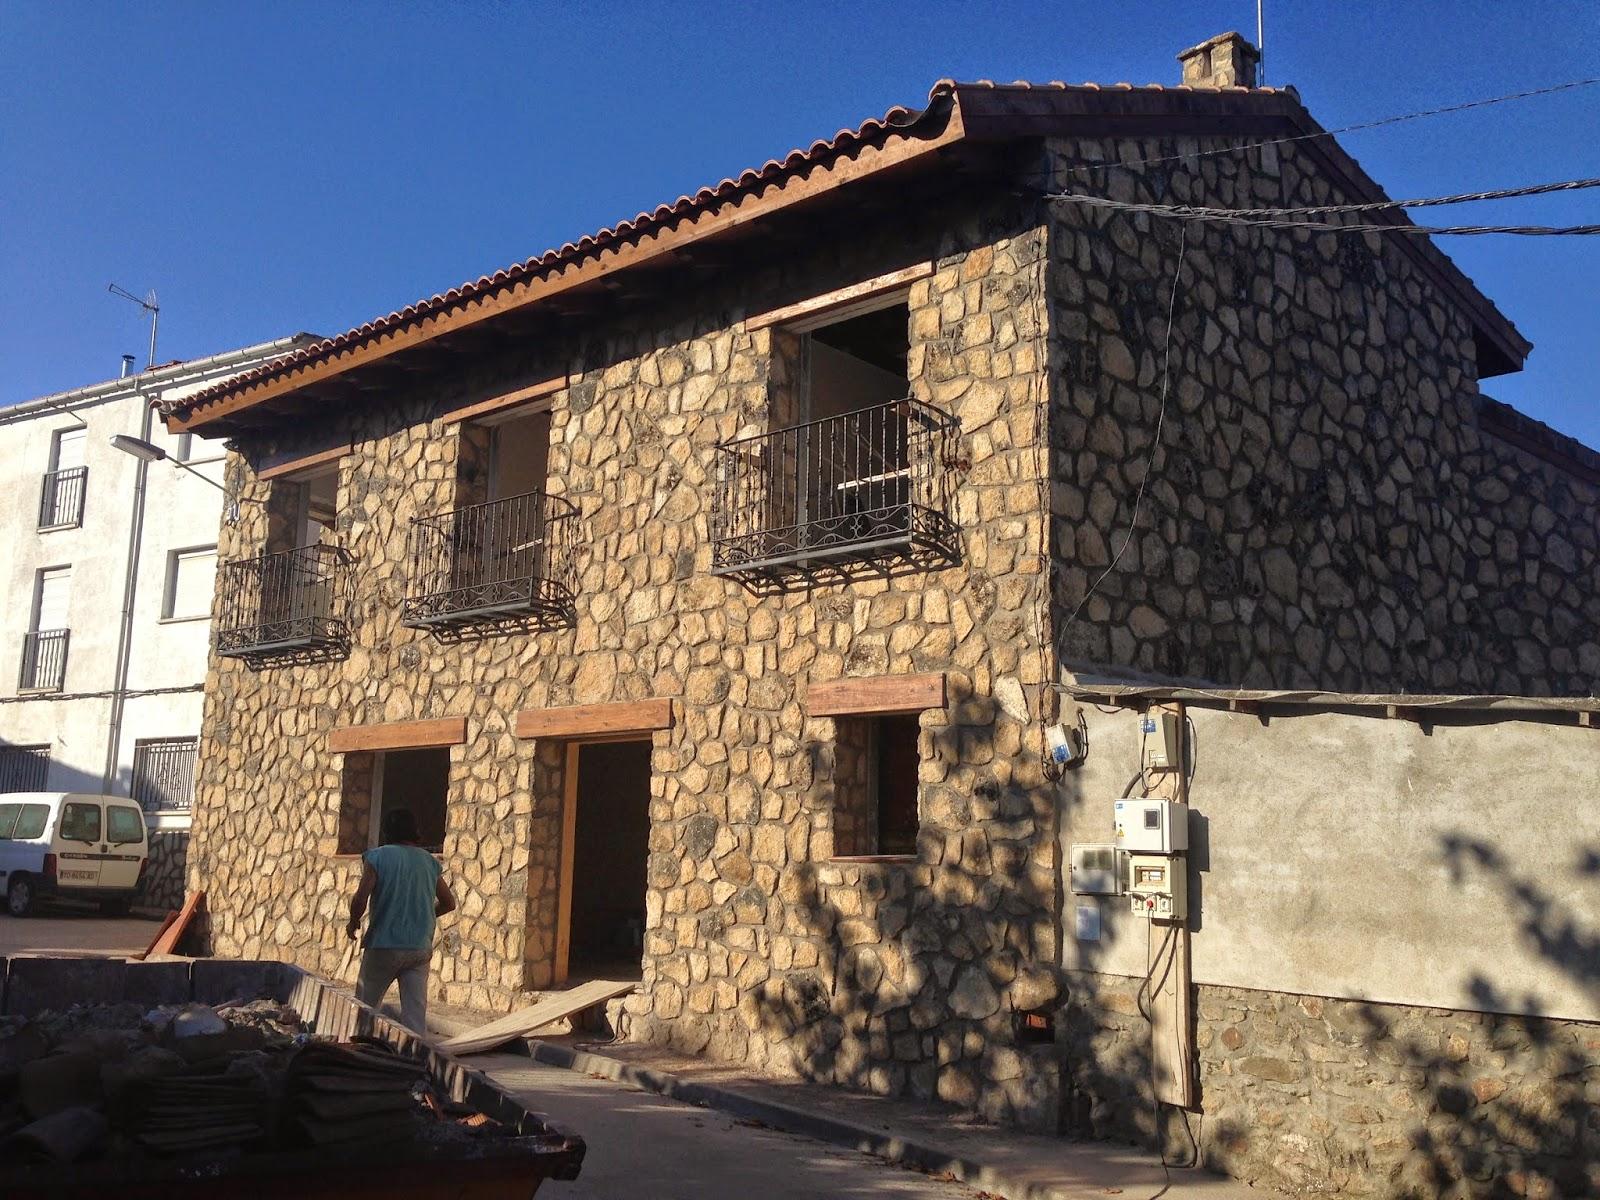 Rehabilitaci n de antigua cuadra para casa rural en - Rehabilitacion casas antiguas ...